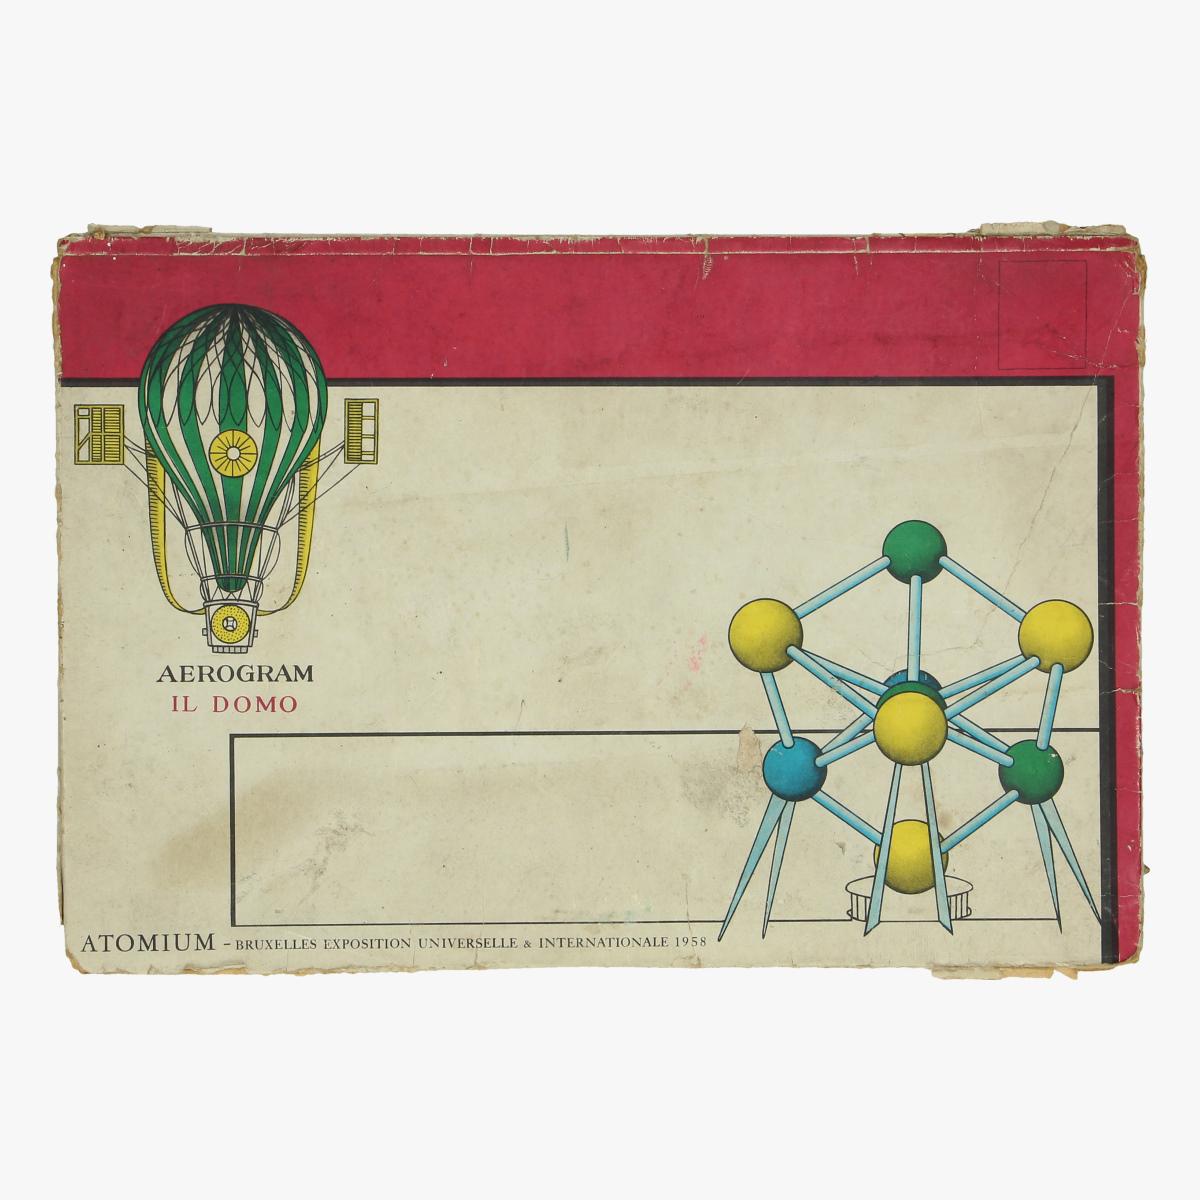 Afbeeldingen van expo 58 aerogram il domo  atomium